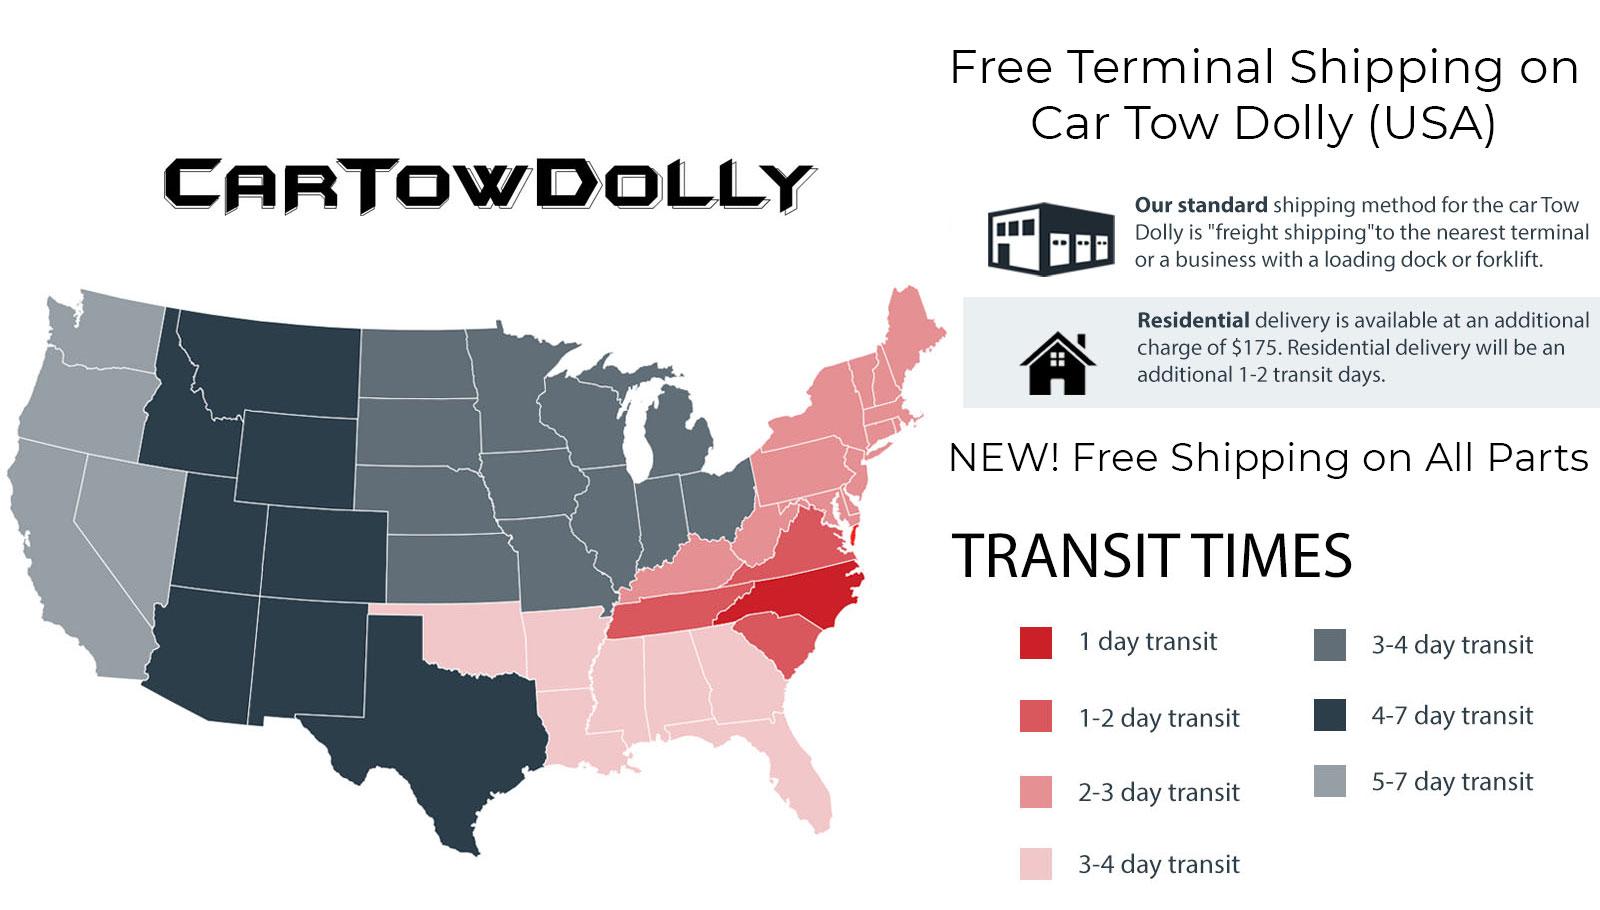 Car Tow Dolly Shipping